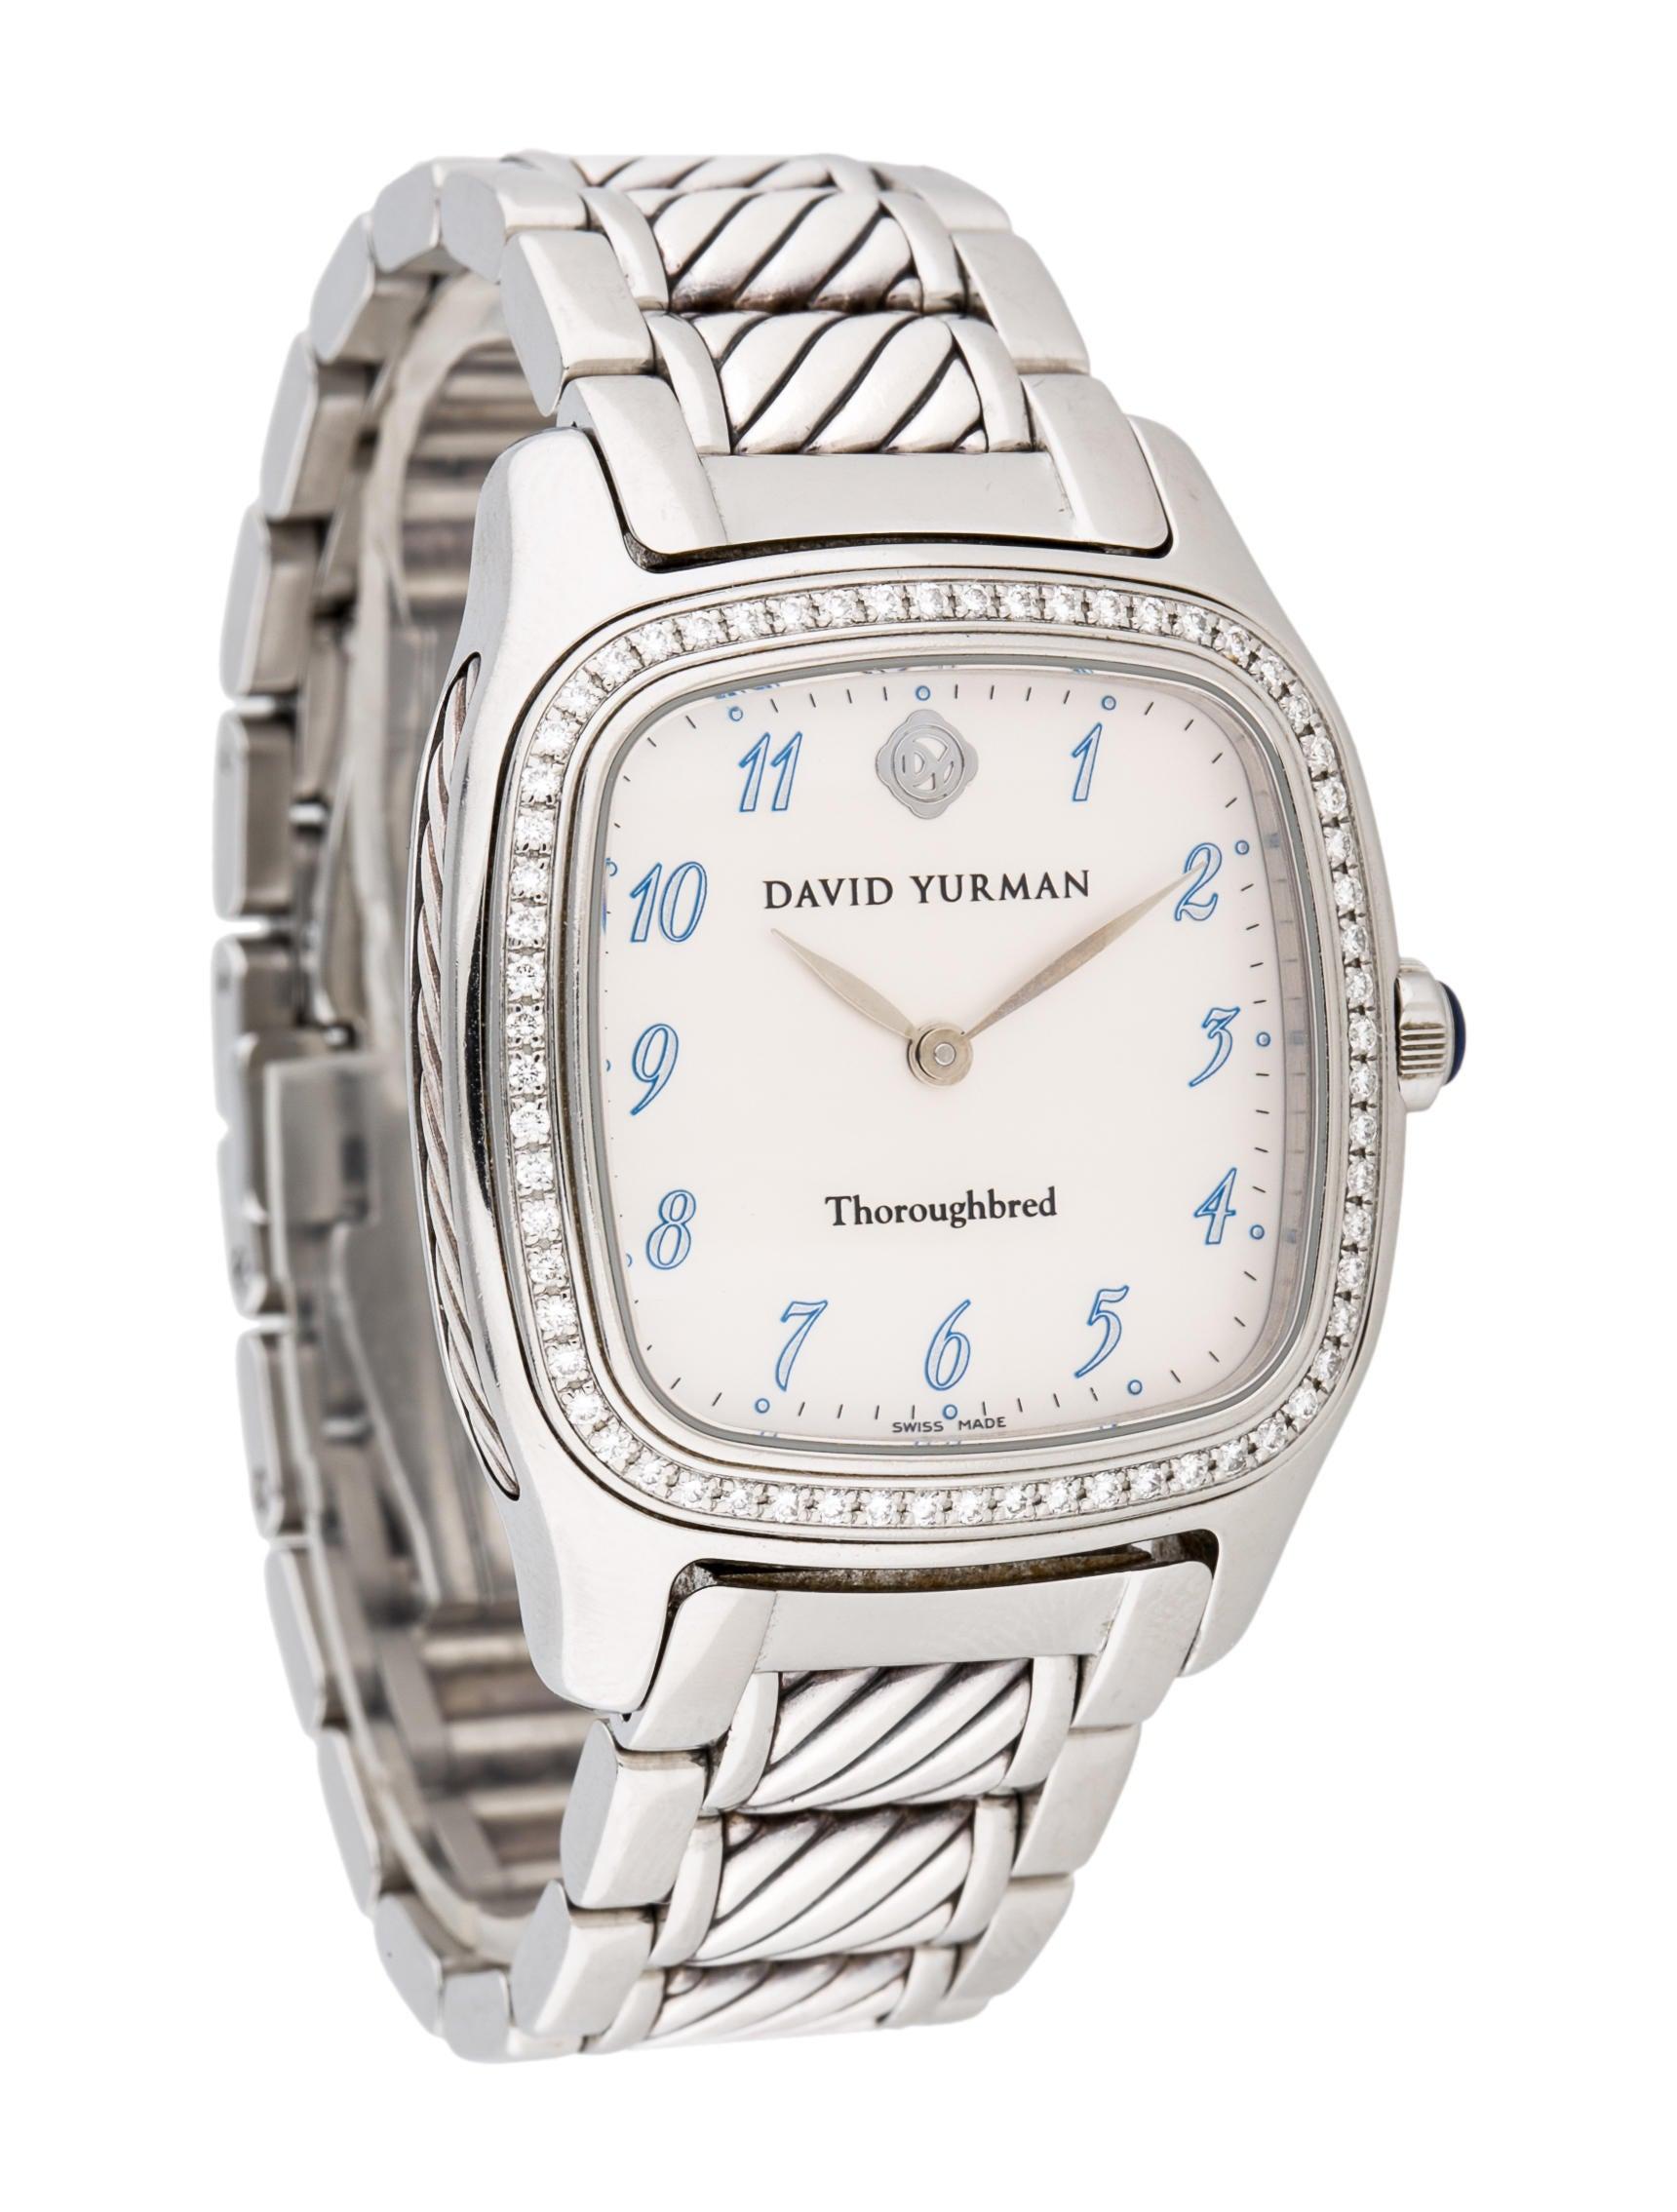 david yurman thoroughbred watches